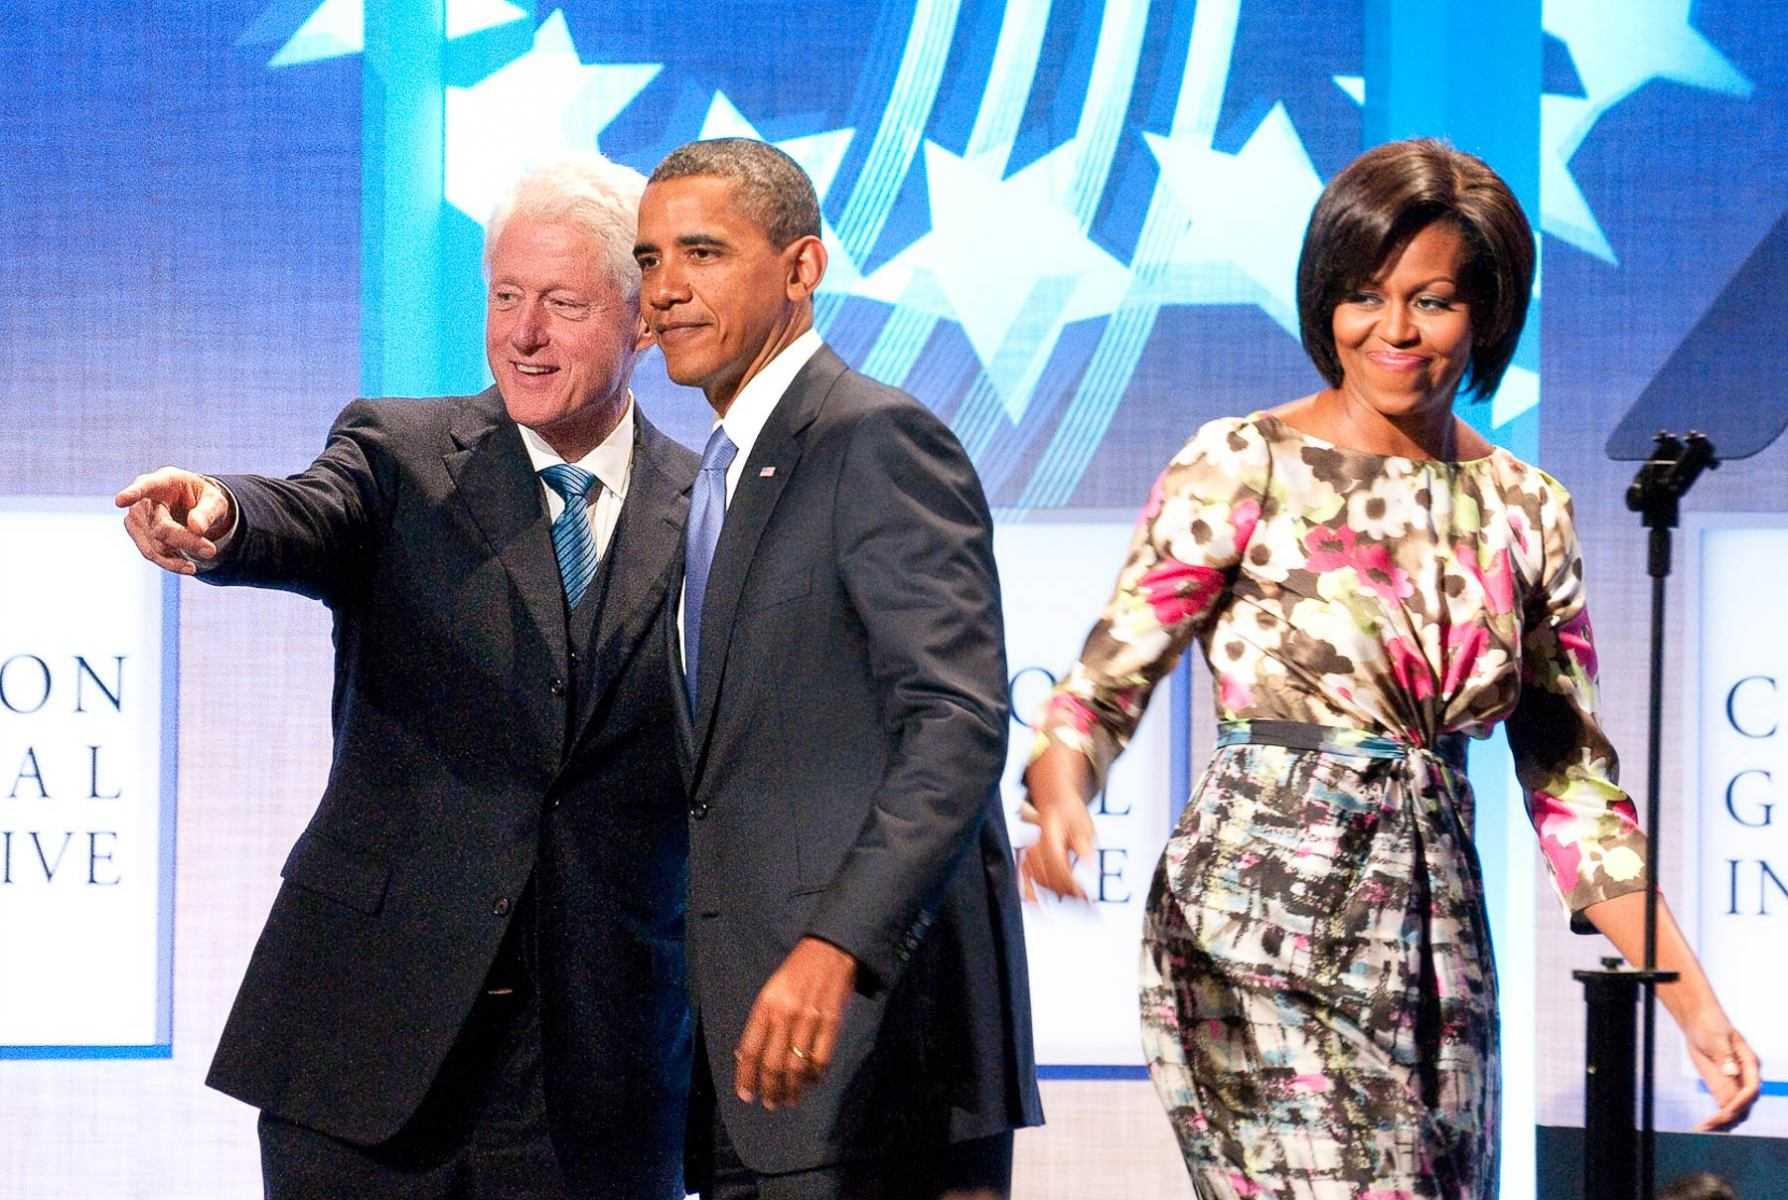 Presidents-bill-Clinton-barak-Obama-and-Michele-Obama